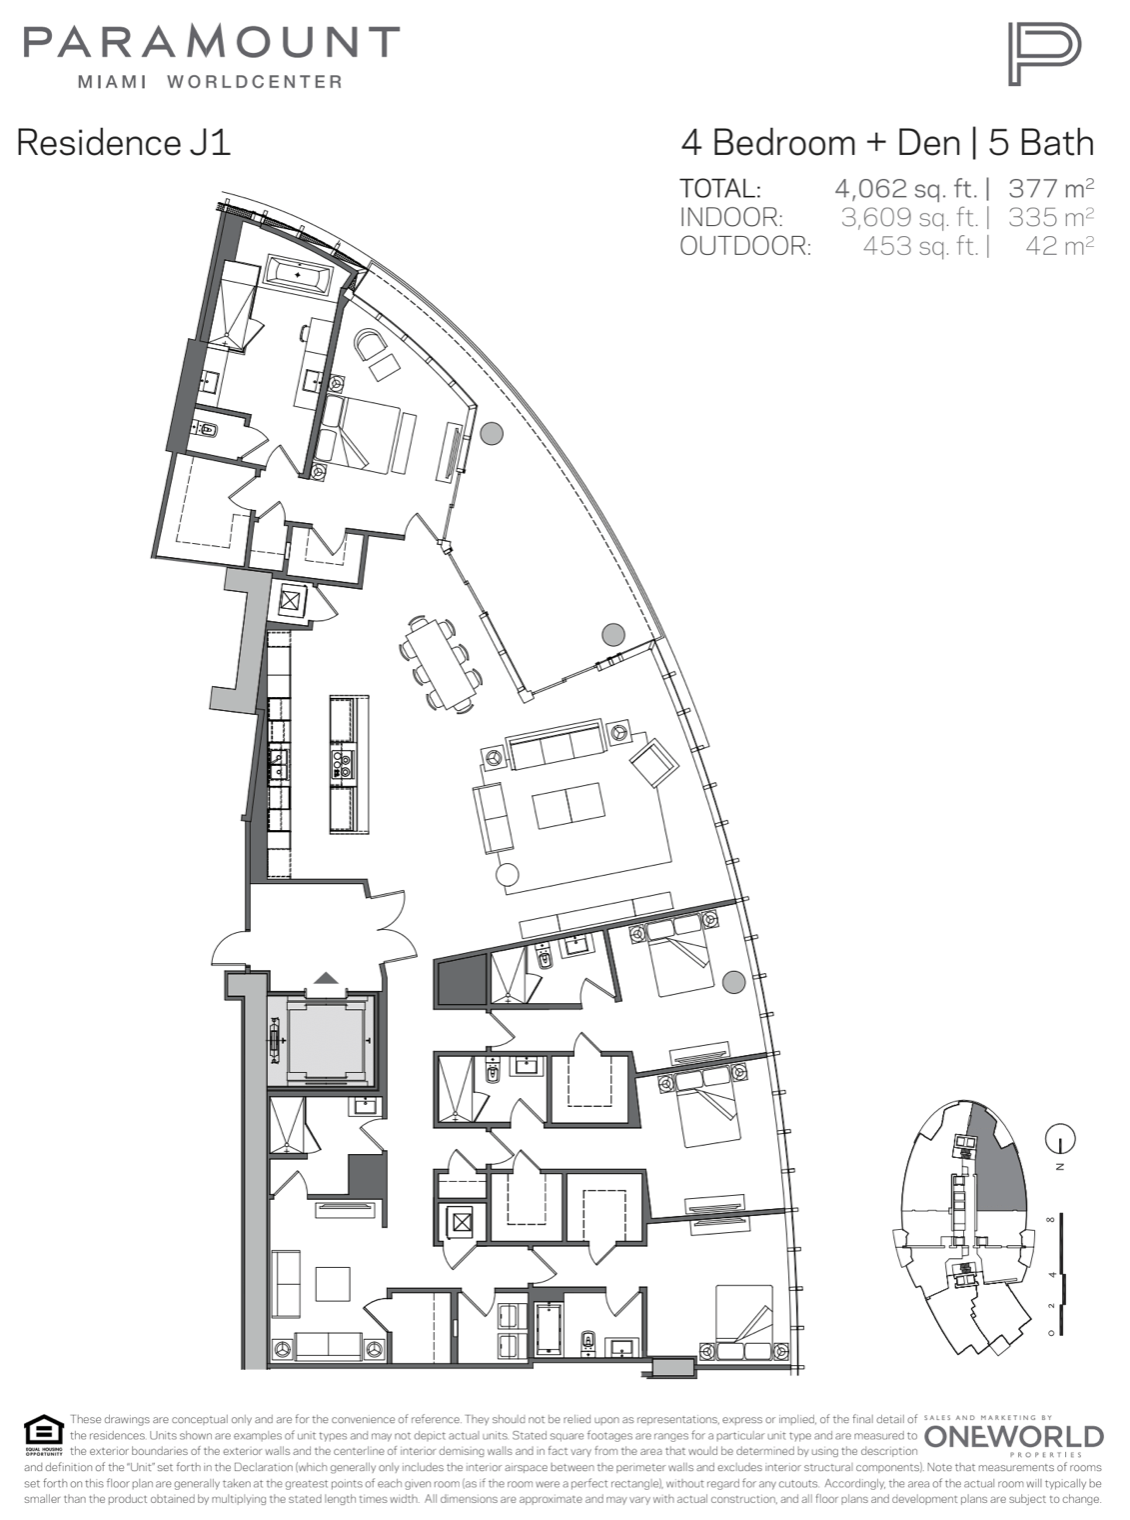 PMWC Penthouse J1